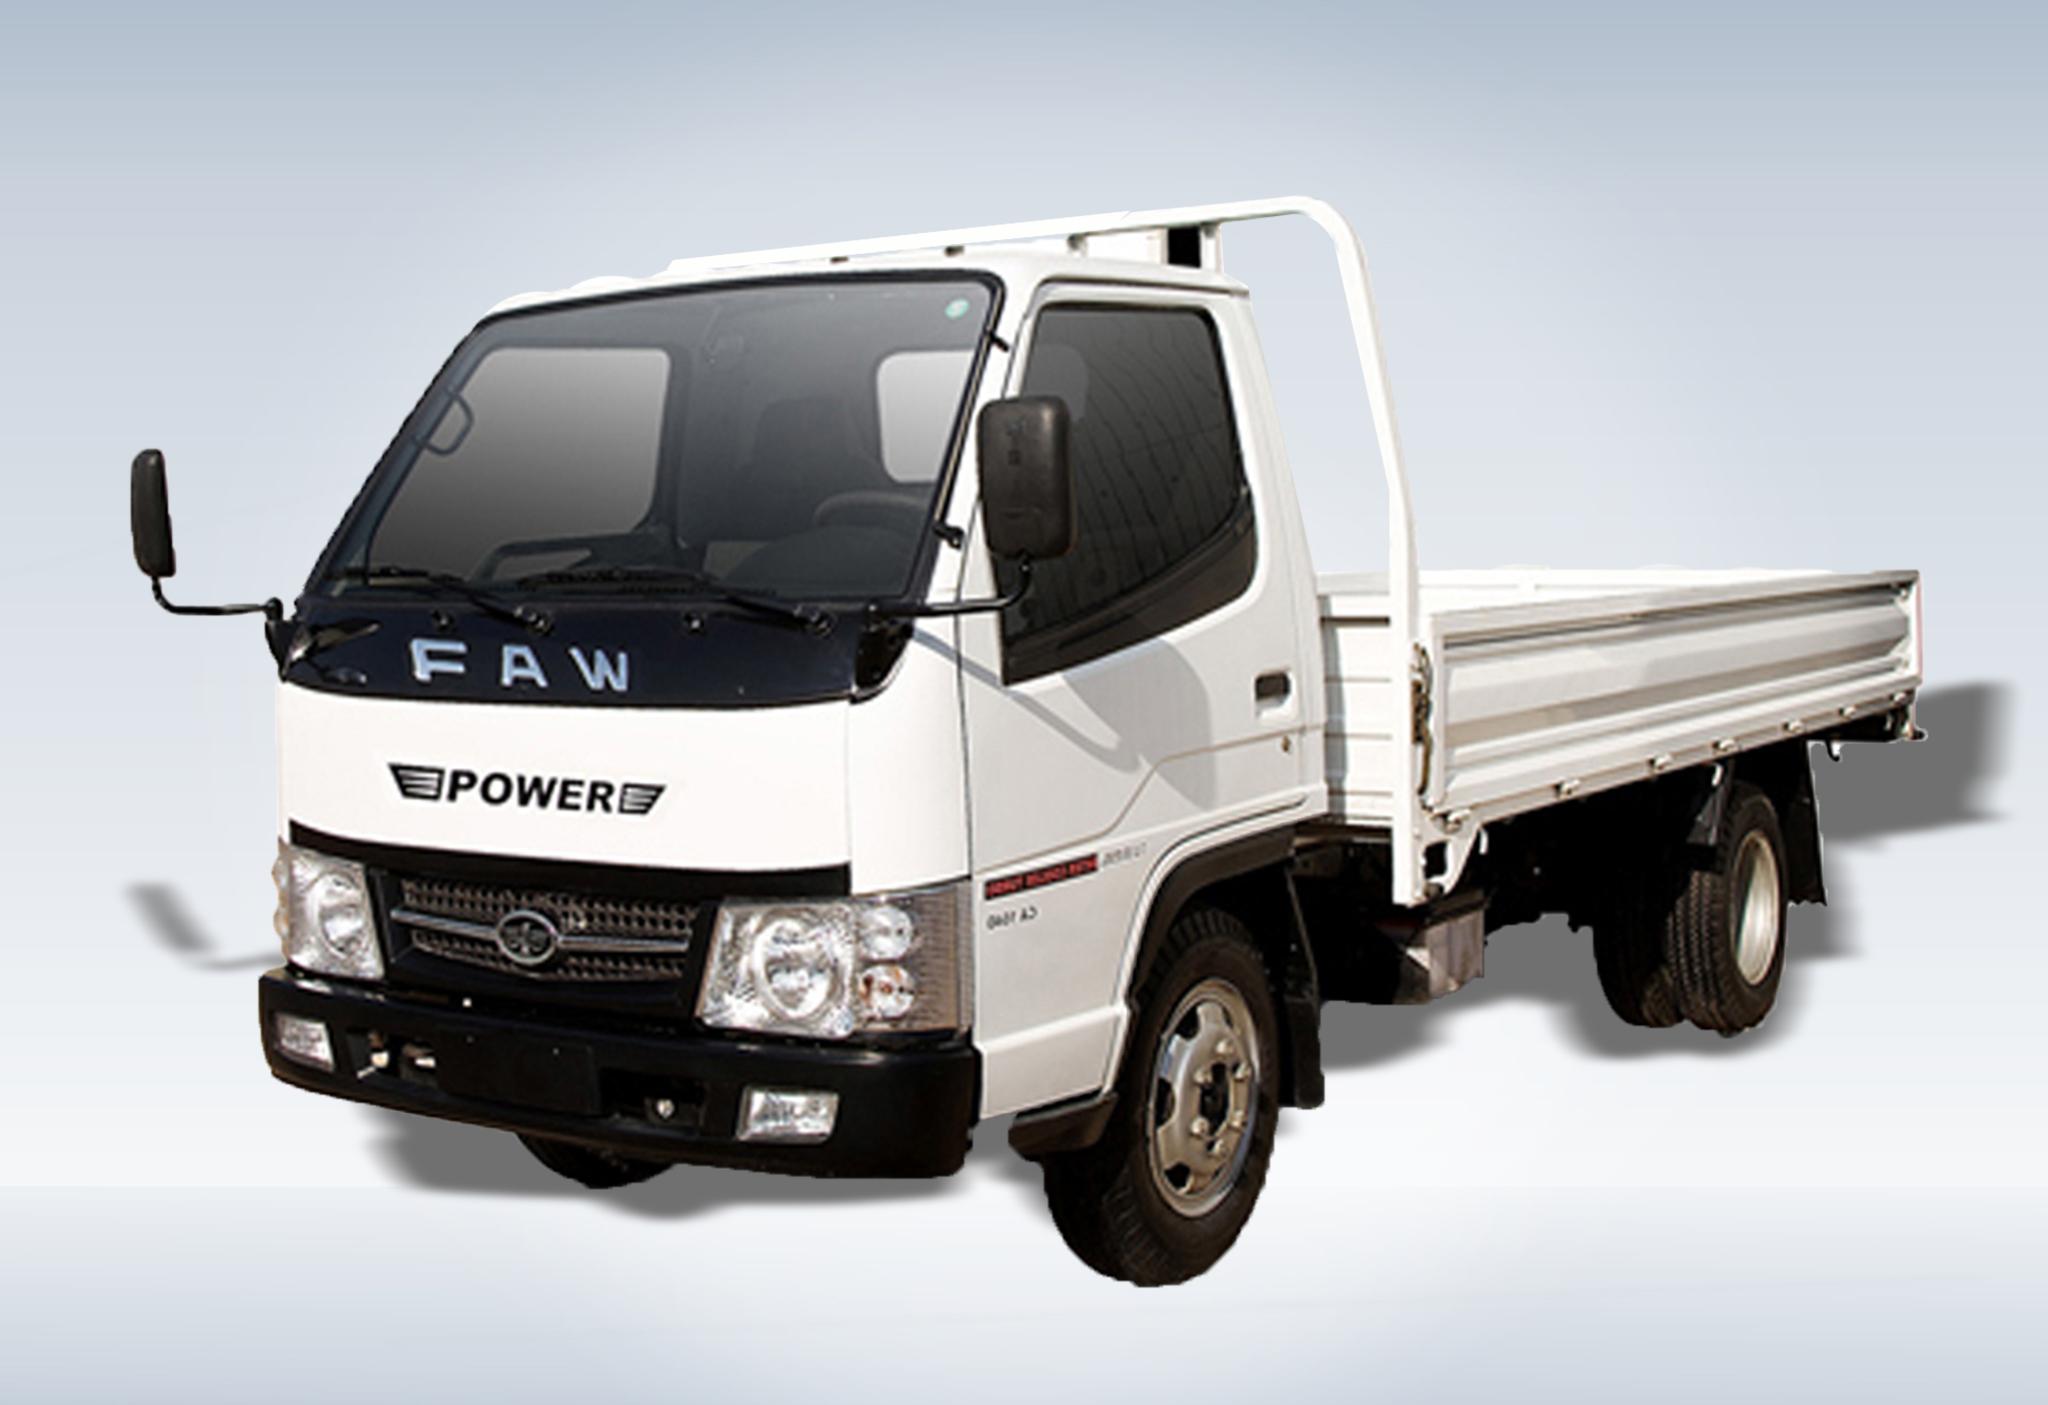 power truck 3 ton